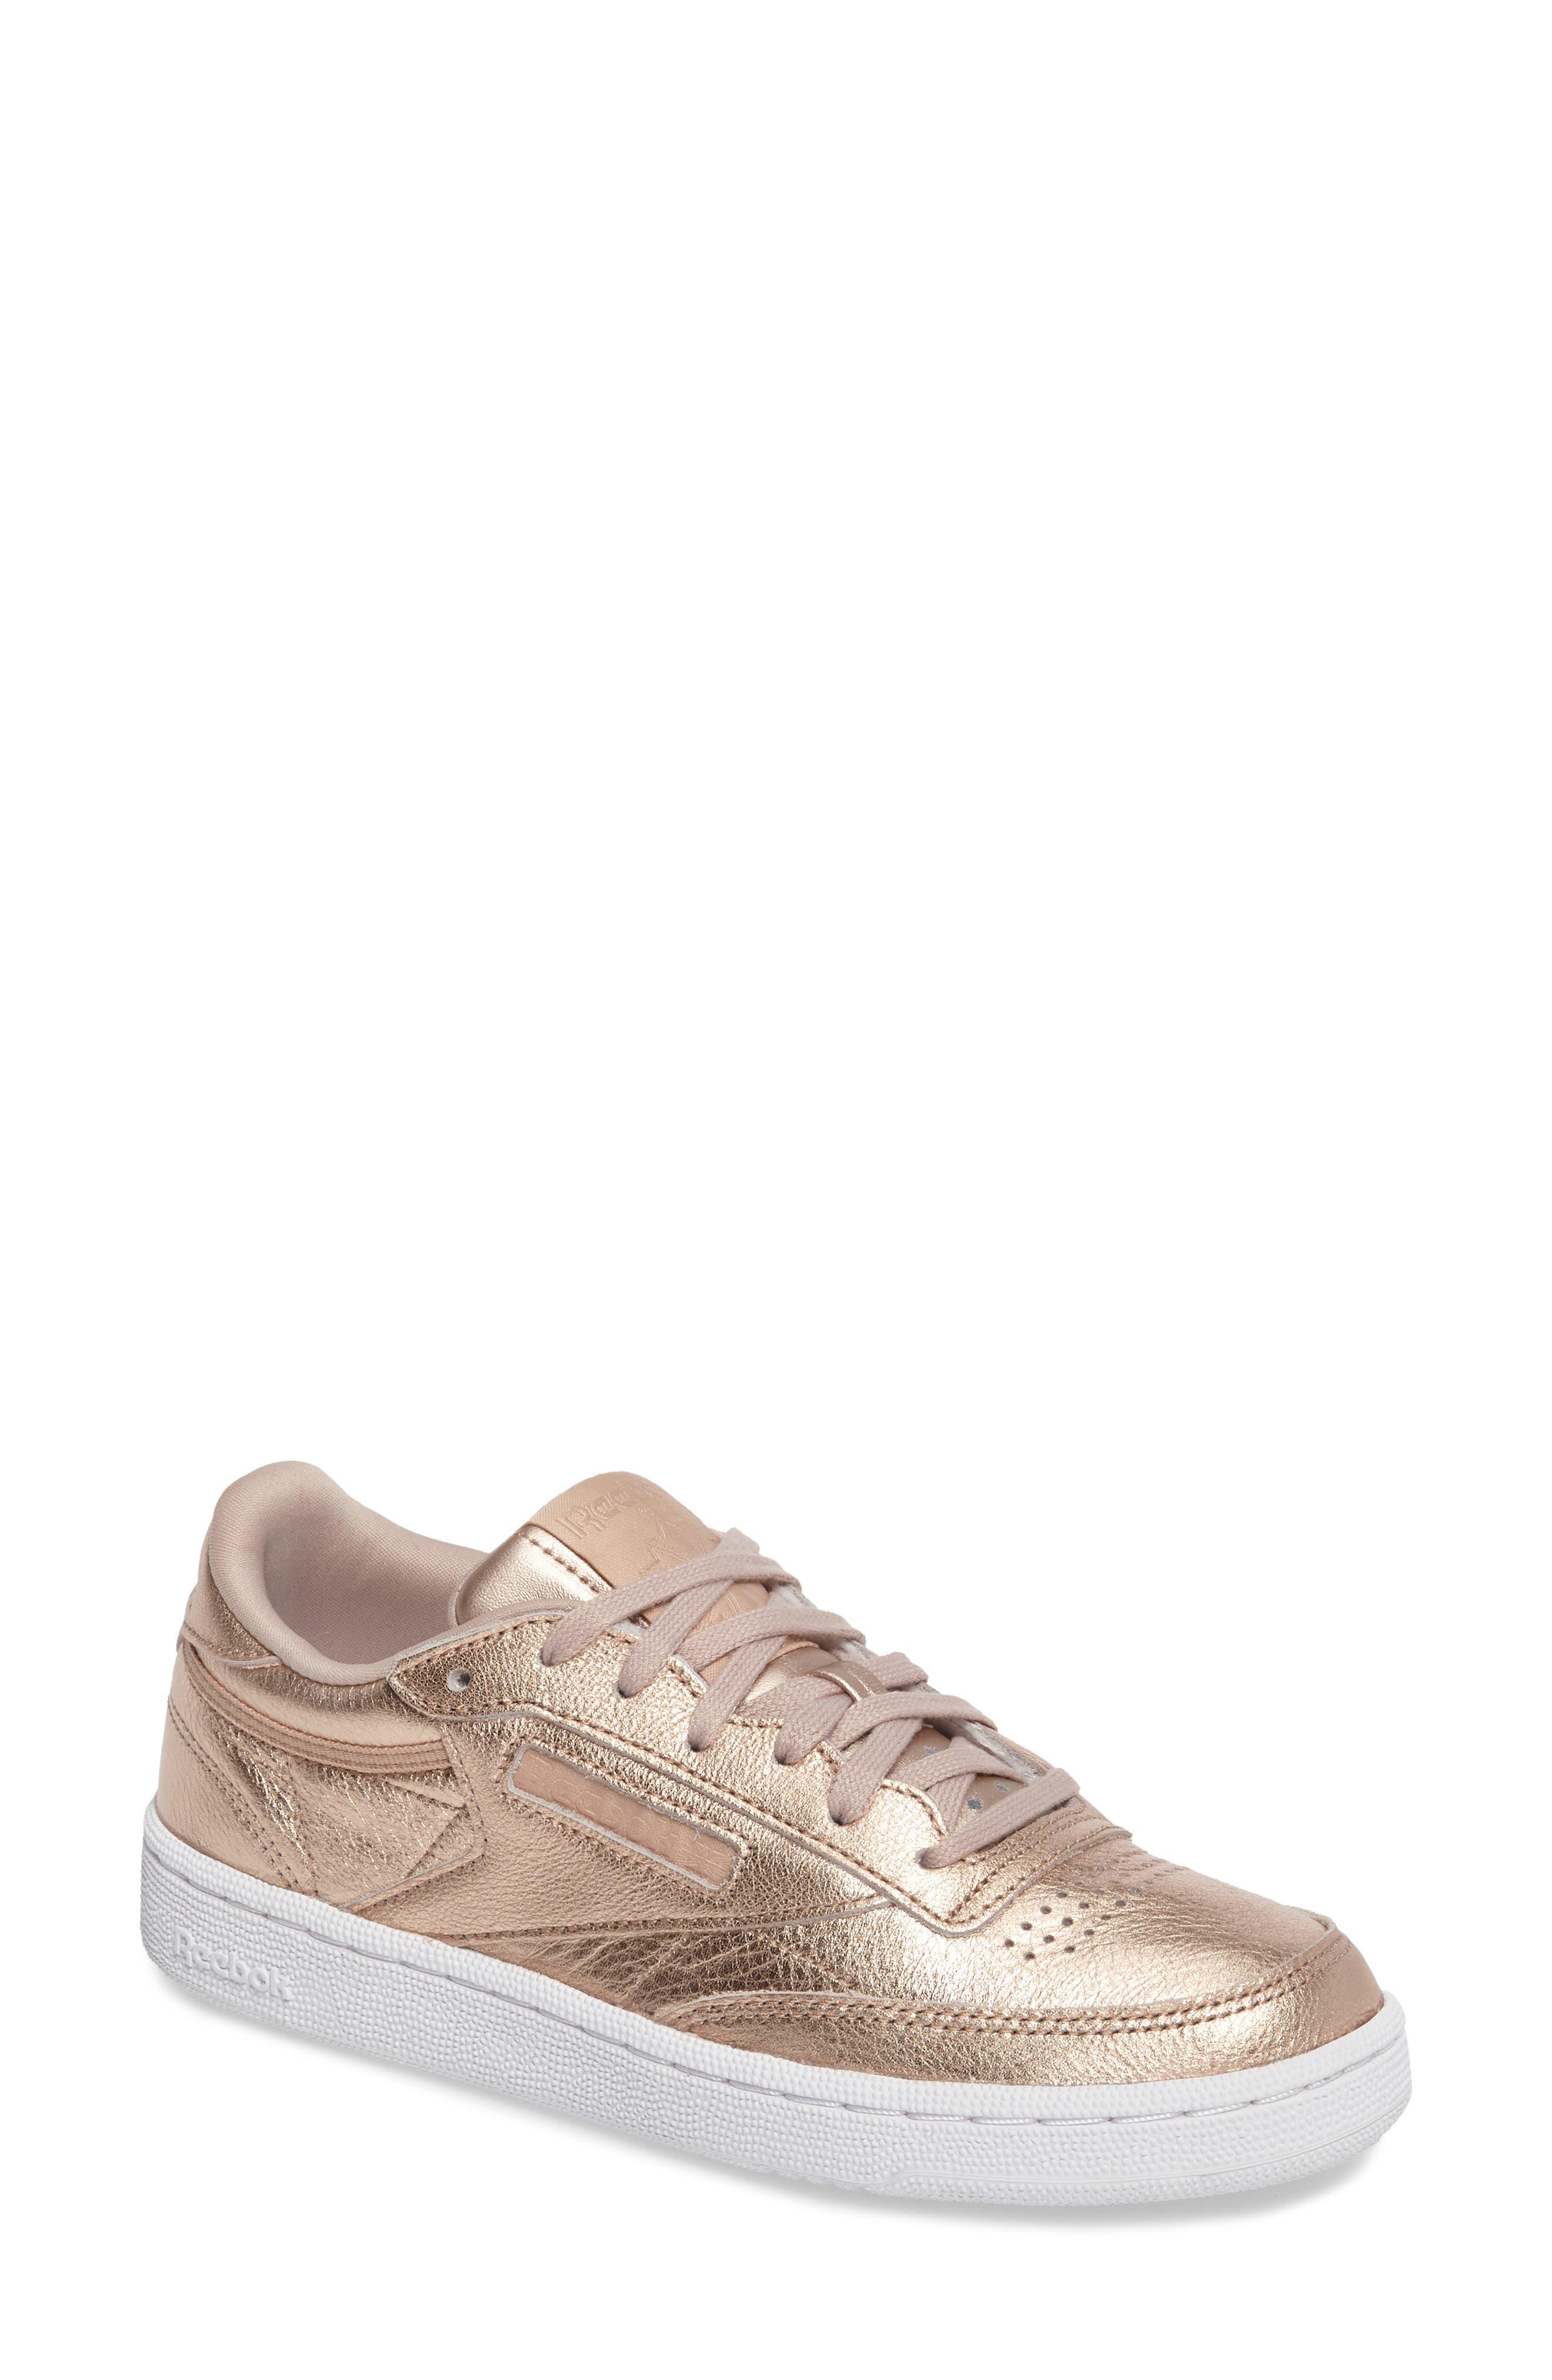 Club C 85 Sneaker,                         Main,                         color, Peach/ White Pearl